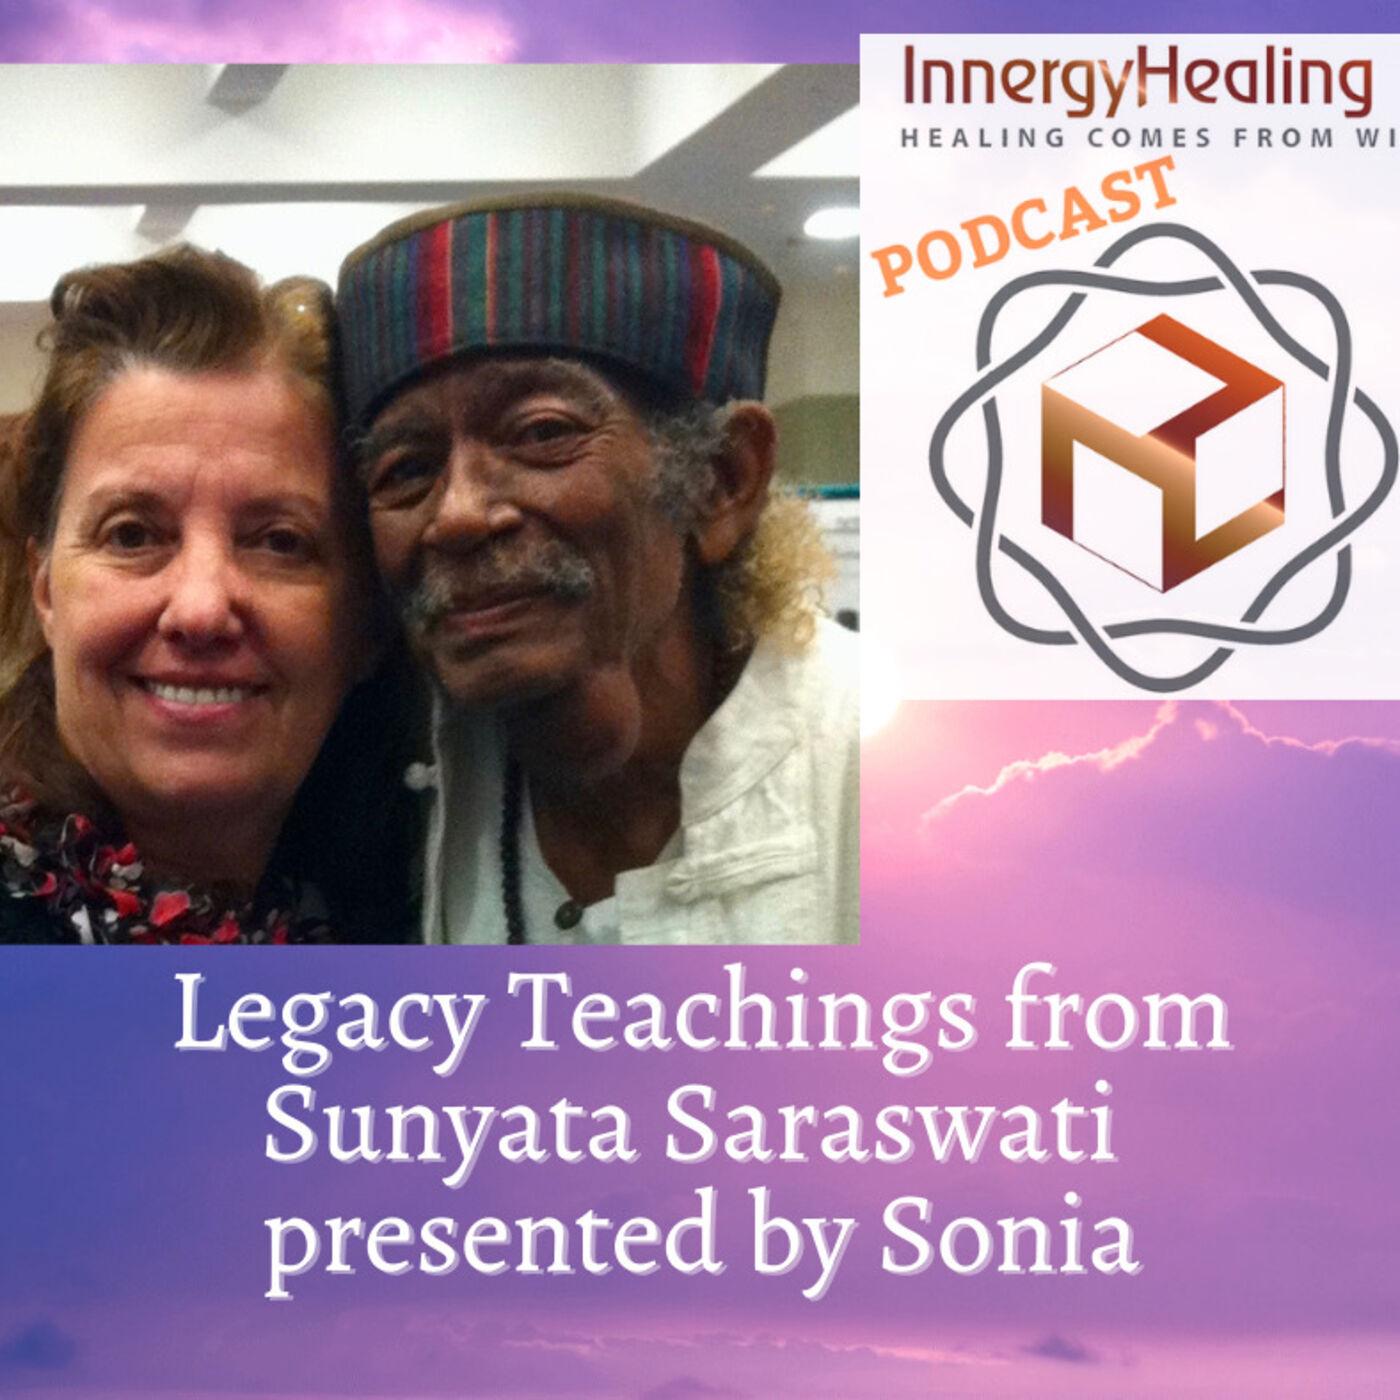 Legacy Teachings from Sunyata Saraswati by Sonia